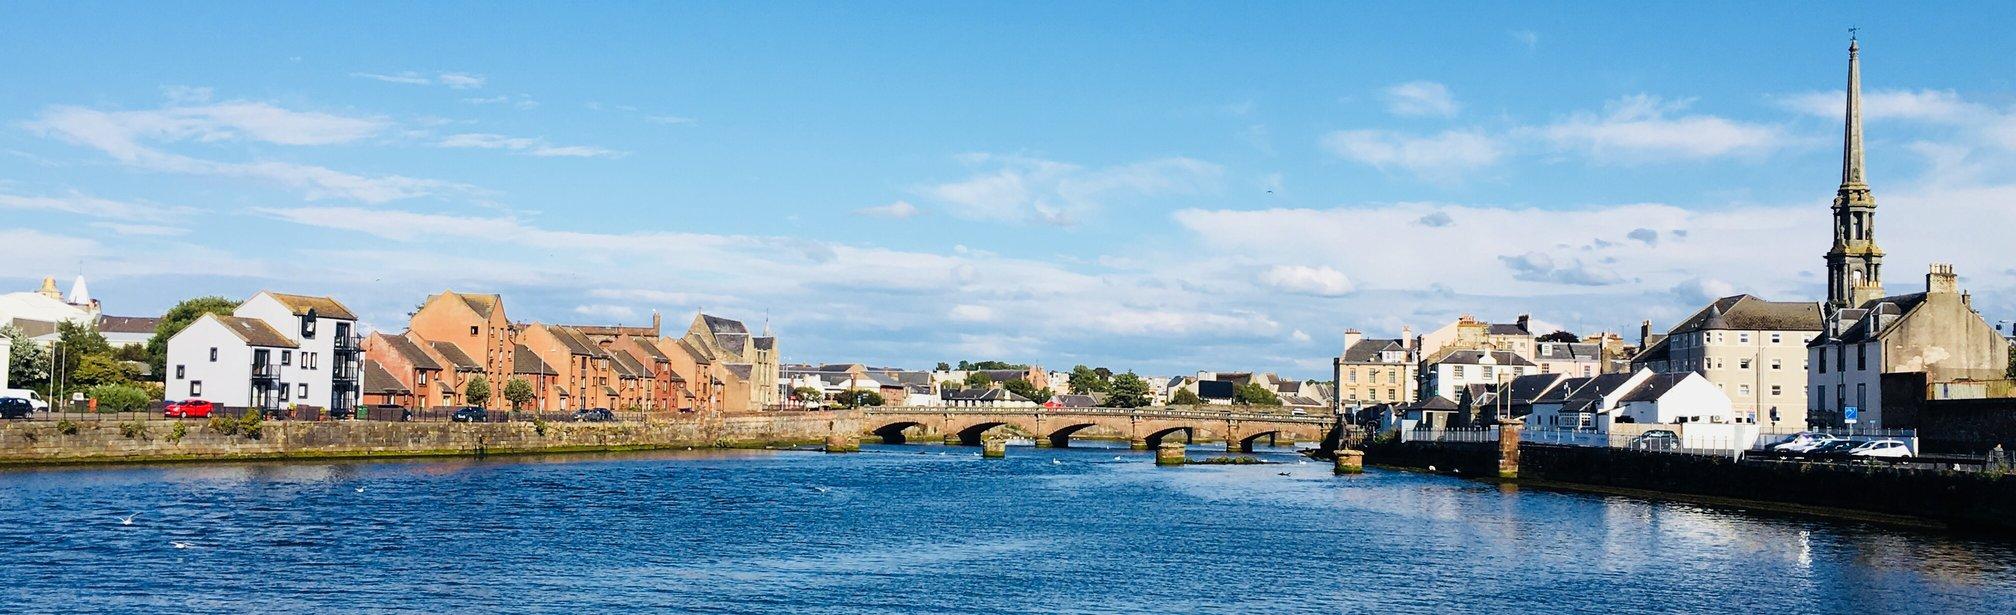 NorthHarbourStreetFlats Bridge and ayrTownHall Long